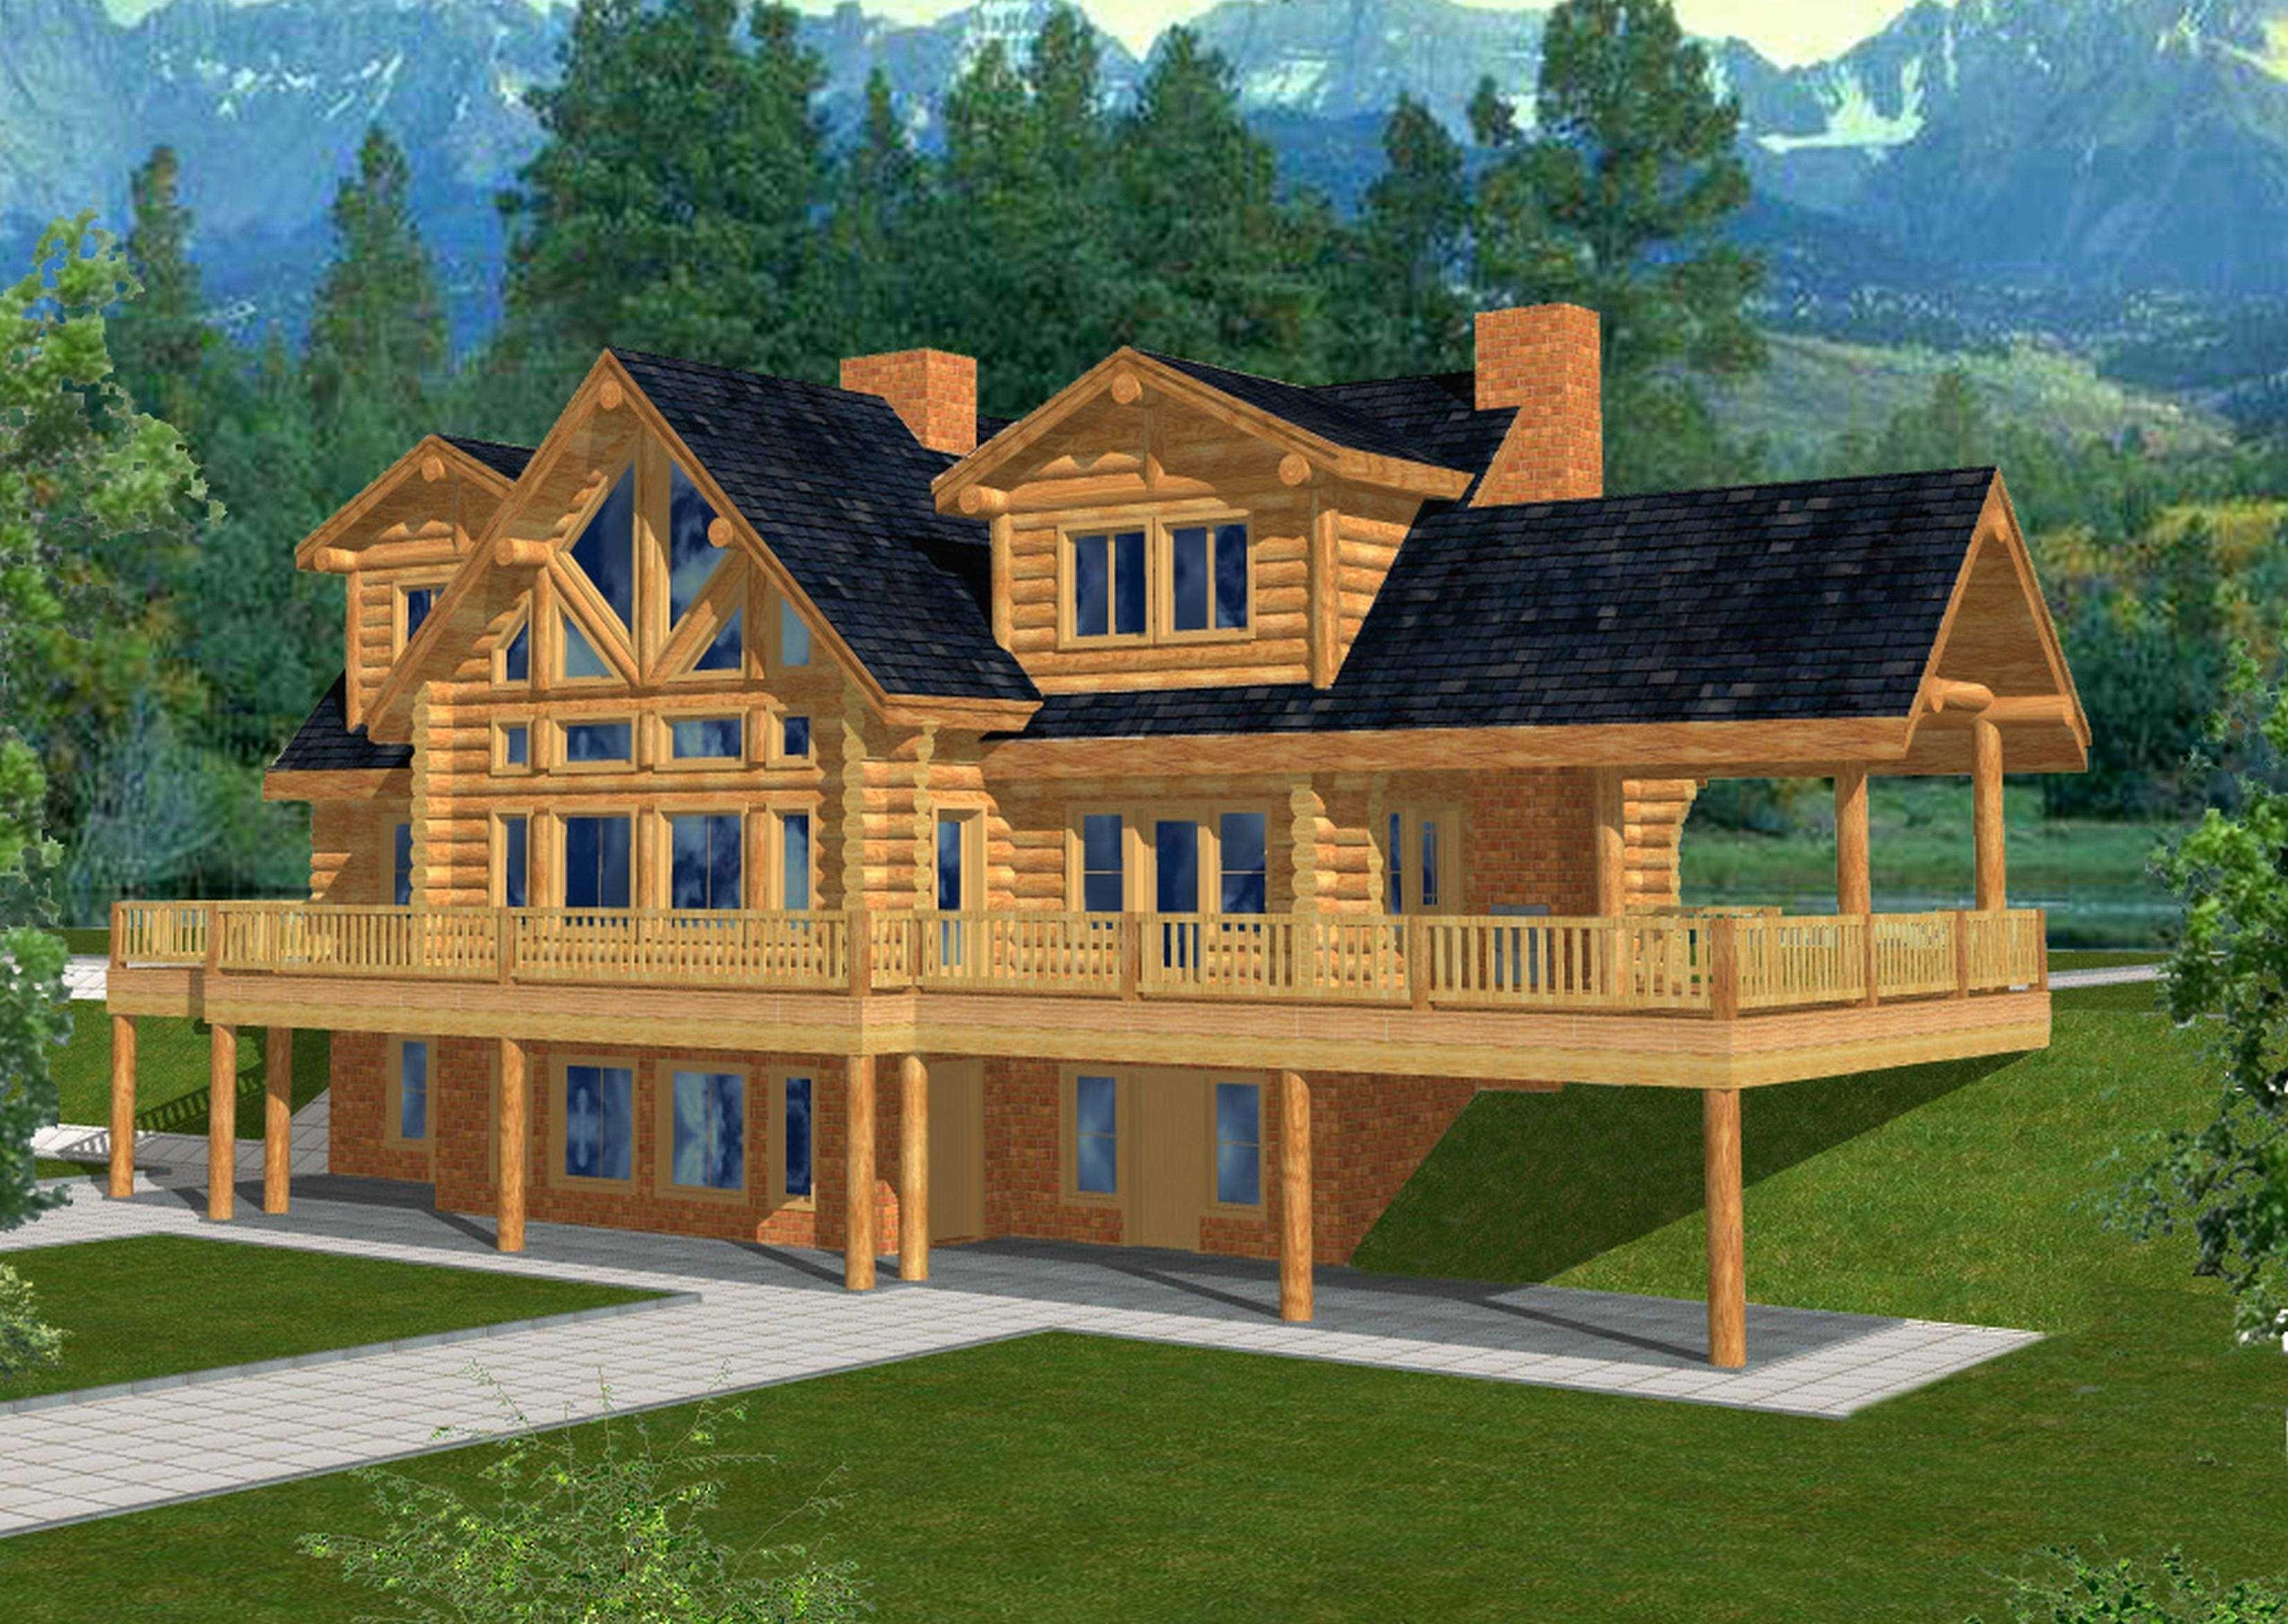 Minecraft townhouse Ideas - Fresh Minecraft townhouse Ideas